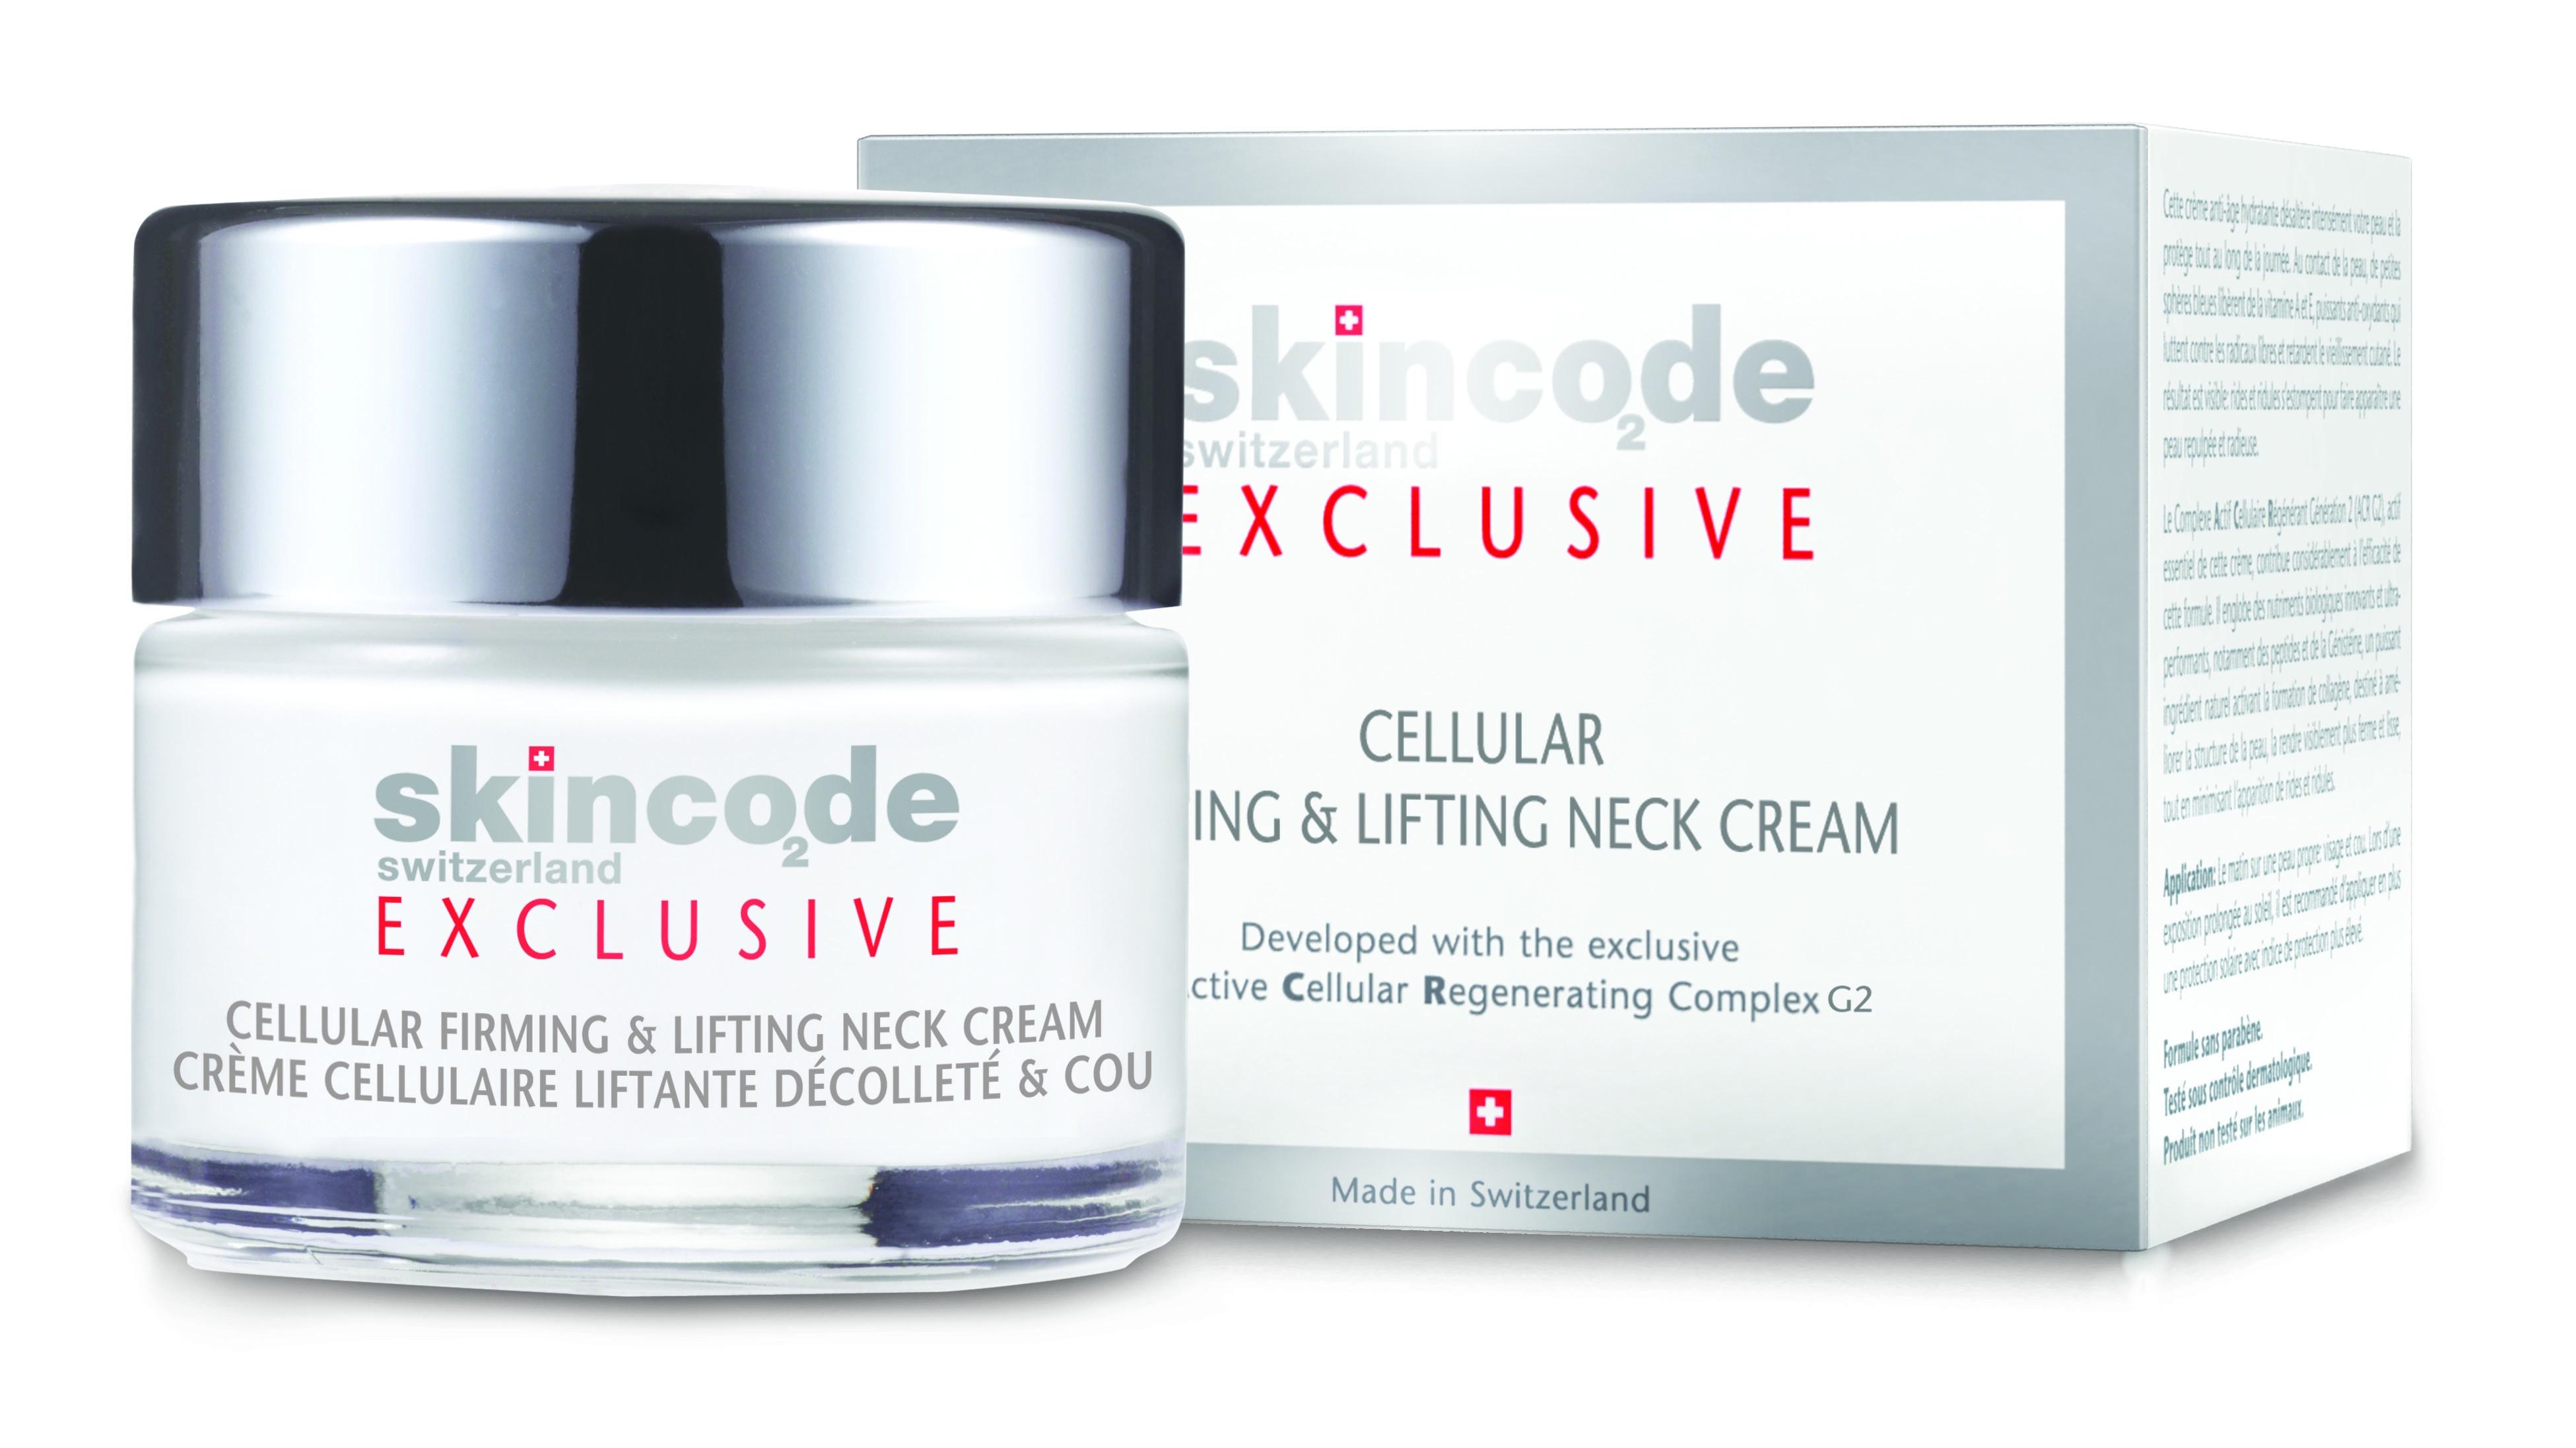 СКИНКОД ЕКСКЛУЗИВ Клетъчен изглаждащ крем за деколте и шия 50мл | SKINCODE EXCLUSIVE Cellular firming and lifting neck cream 50ml